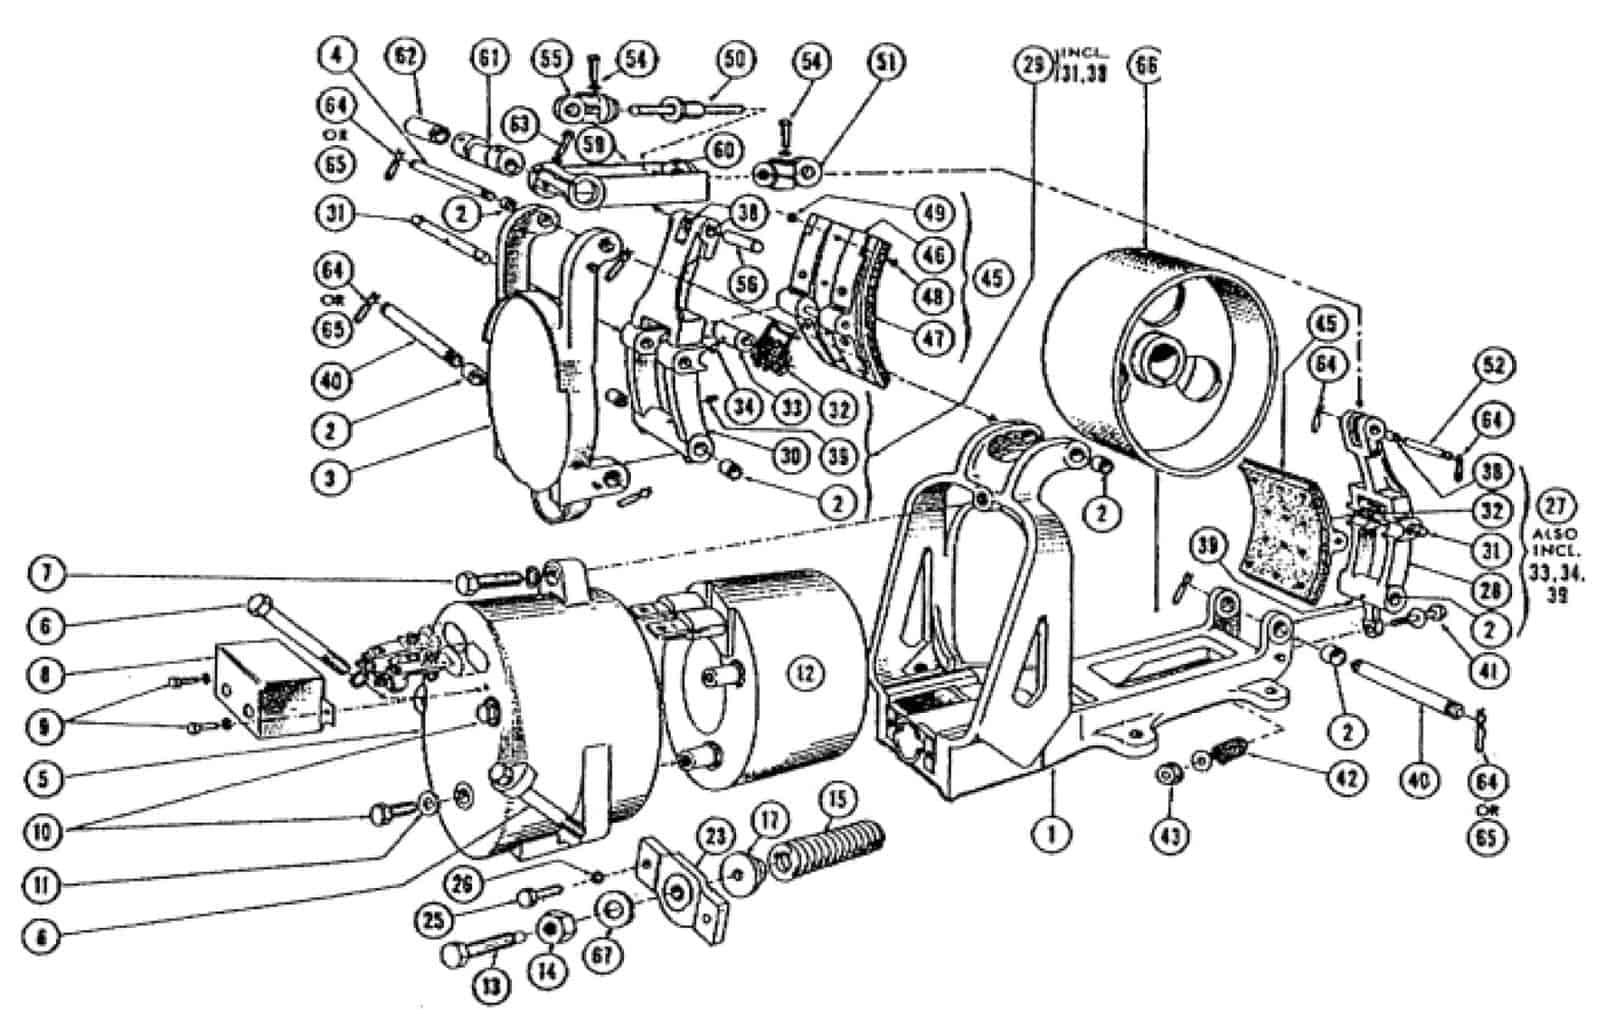 CLARK 13 DC MAGNETIC BRAKE